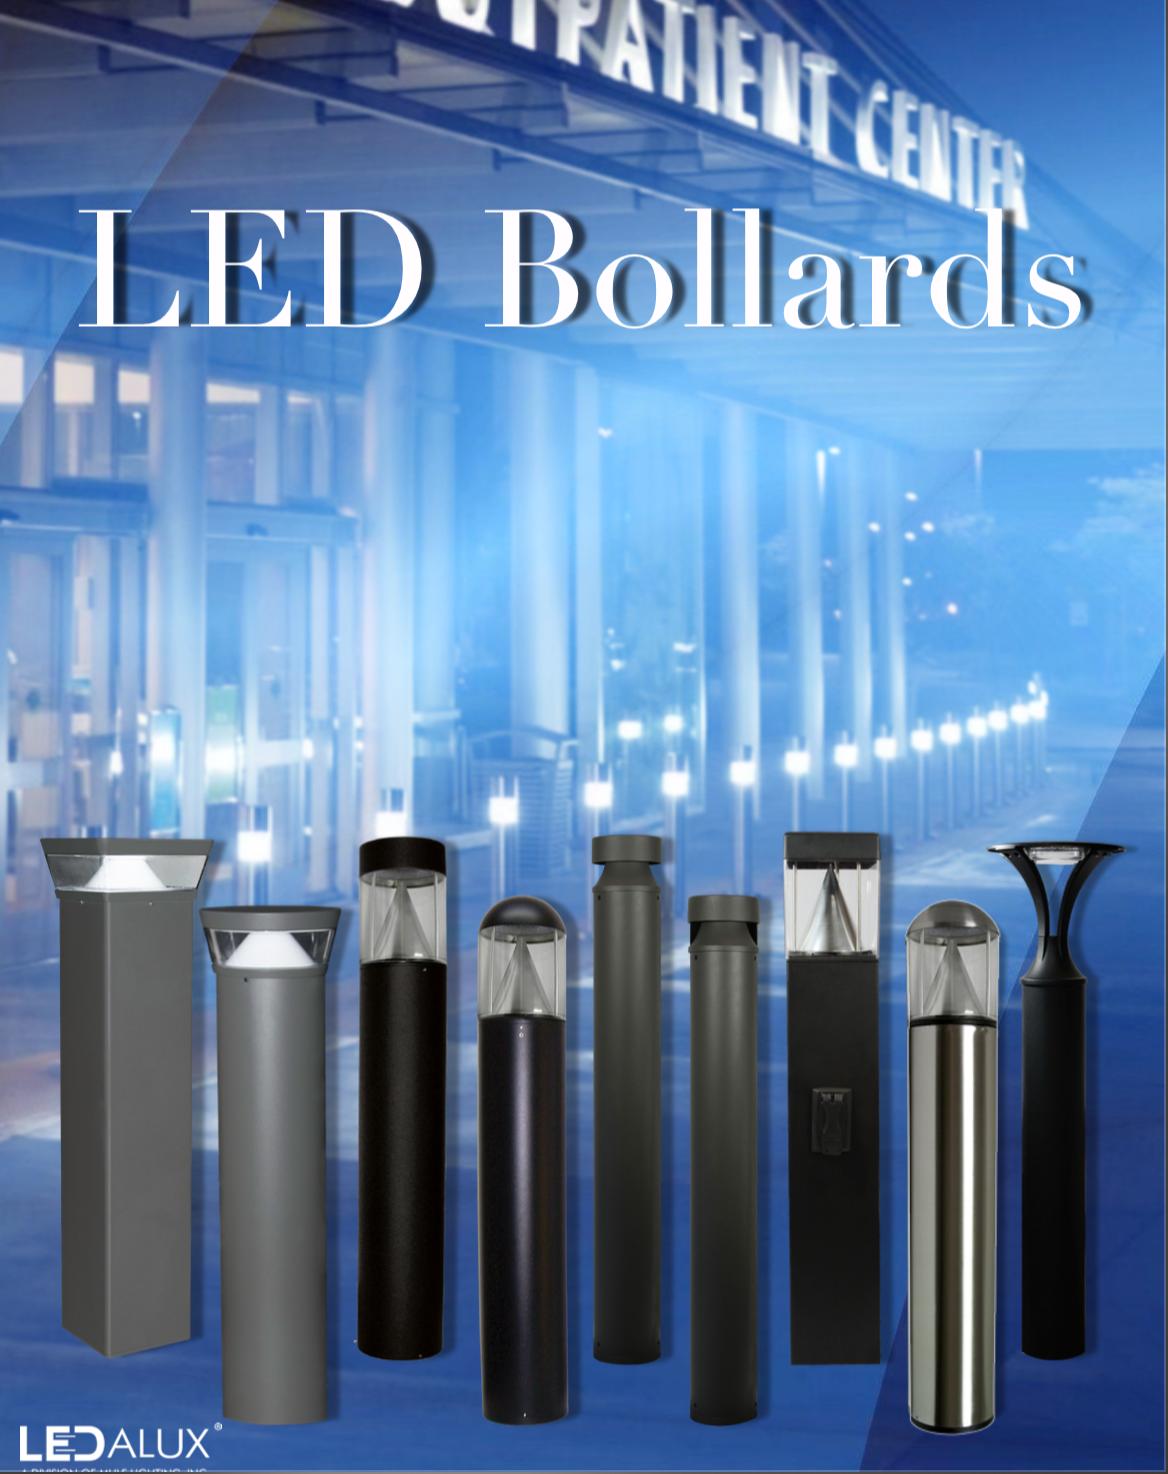 LEDalux LED Bollards Literature